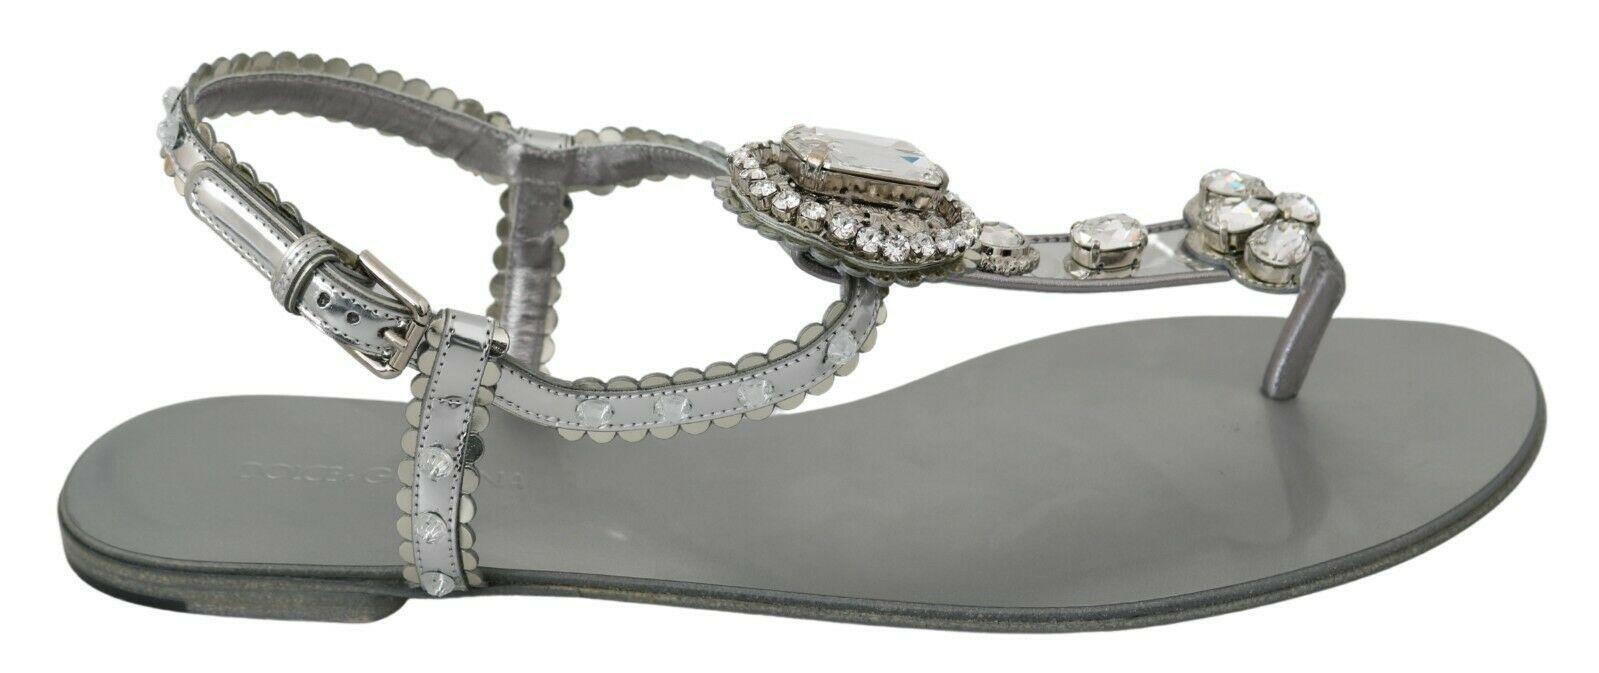 Dolce & Gabbana Women's Crystal Sandals Silver LA6578 - EU36/US5.5